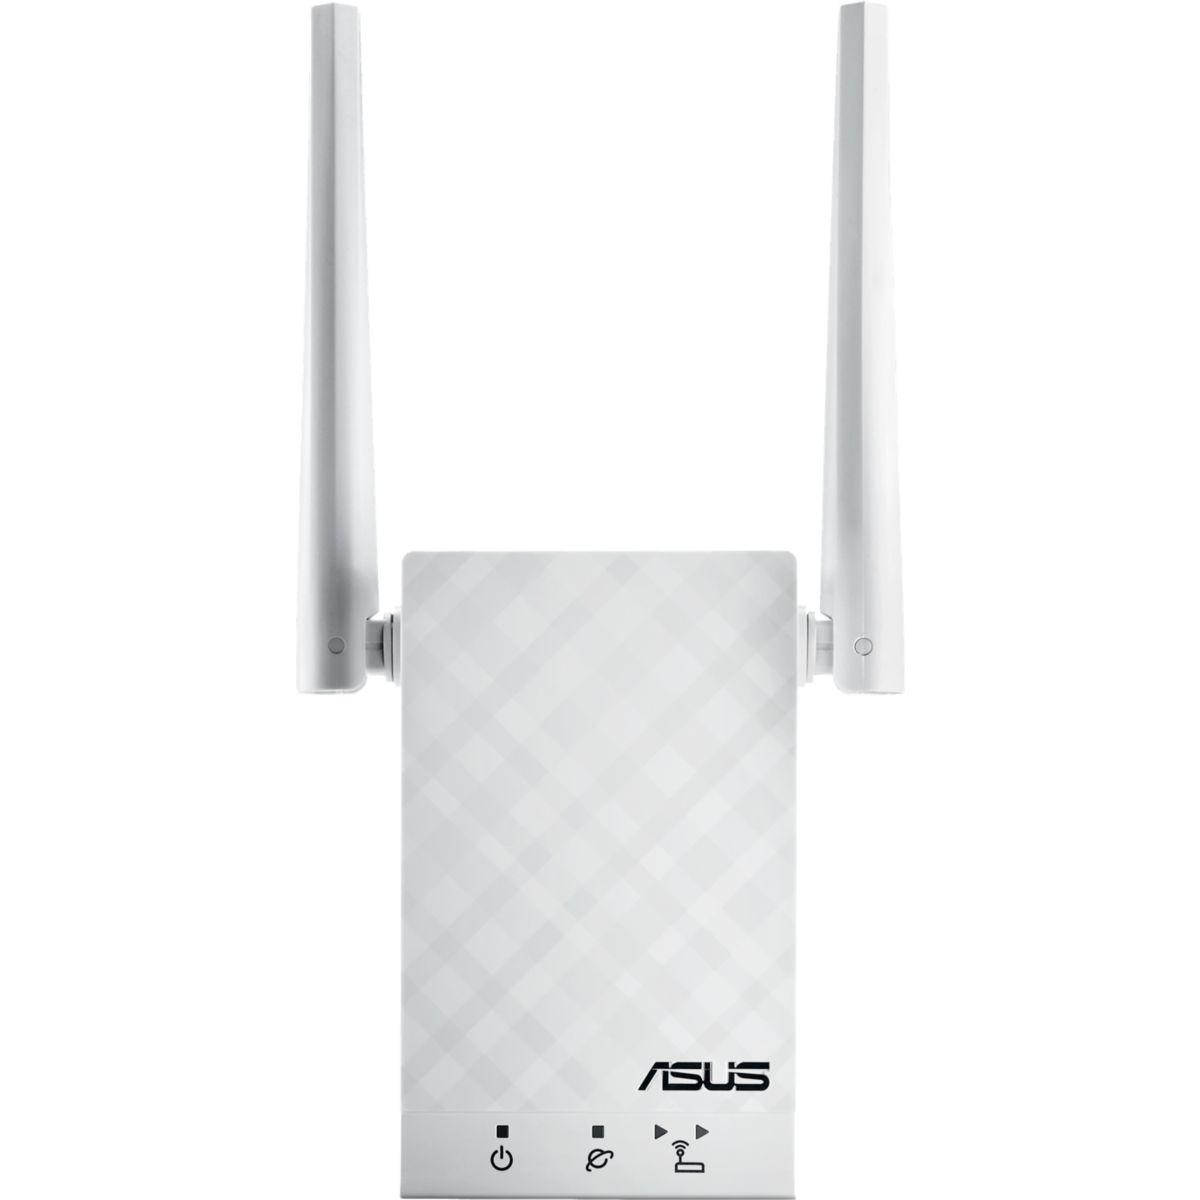 Modem/Routeur Wifi/3G/4G ASUS WIFI Double bande AC1200 RP-AC55